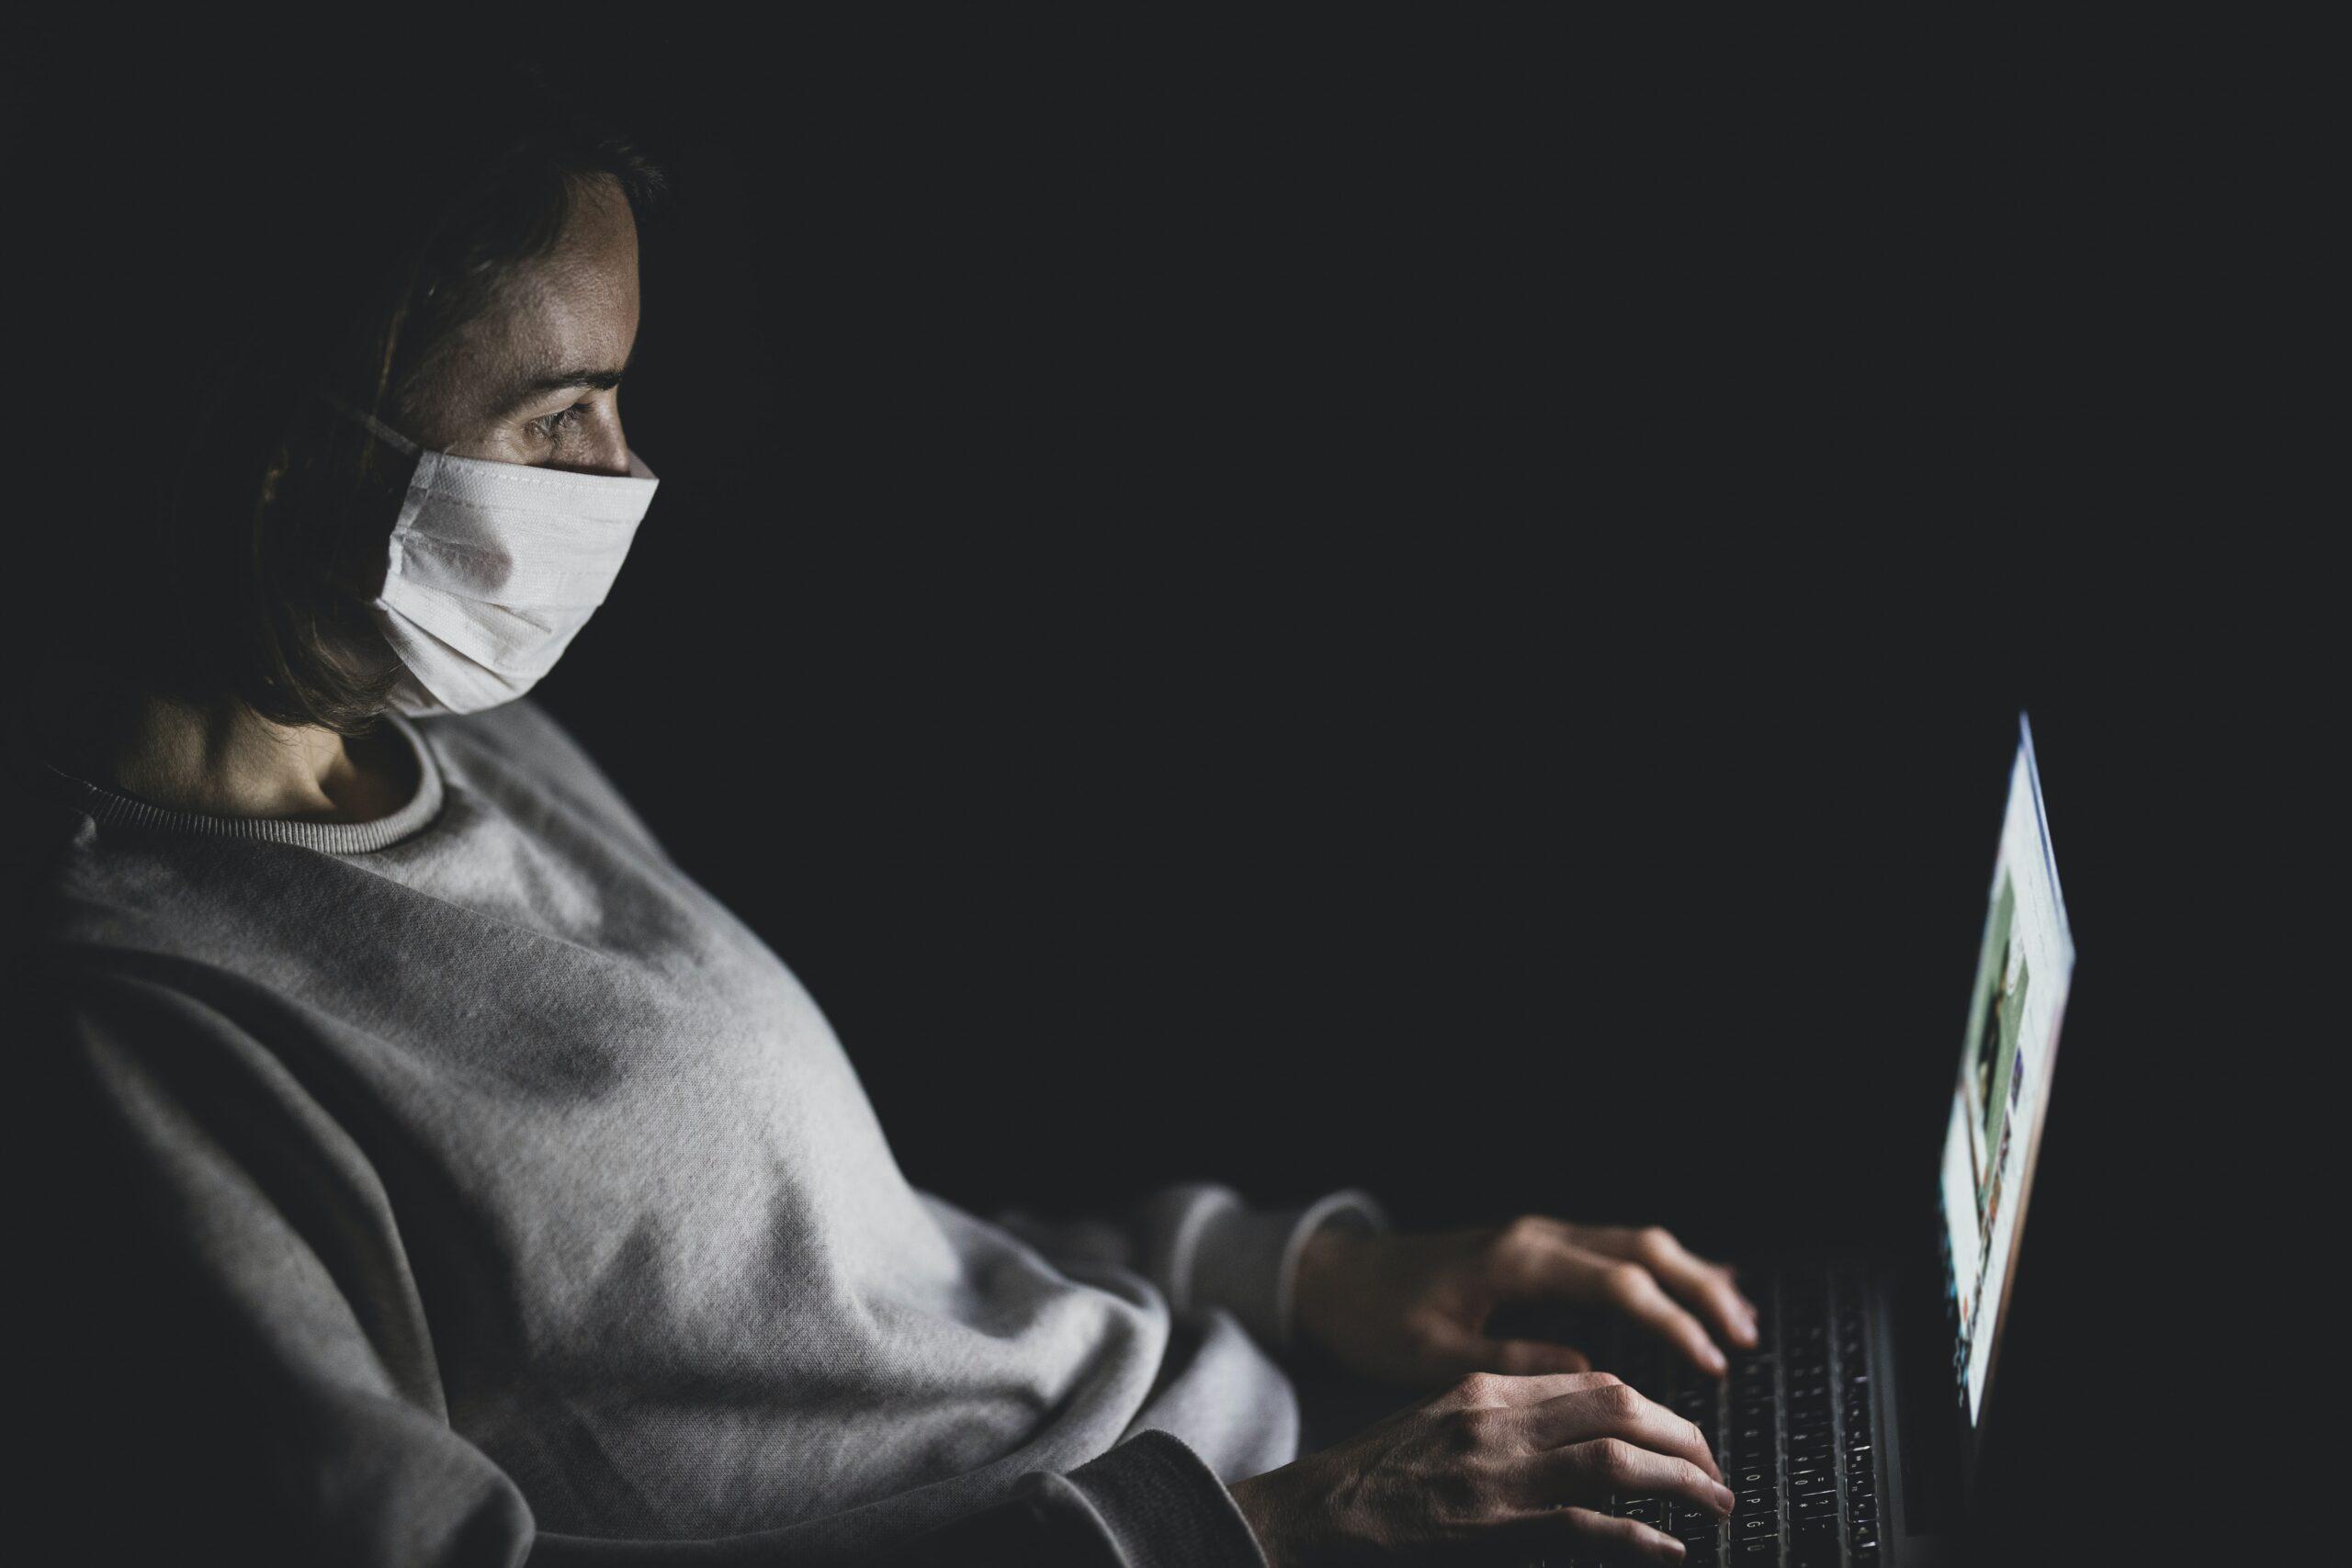 engin-akyurt-Student with mask studying on laptop-unsplash